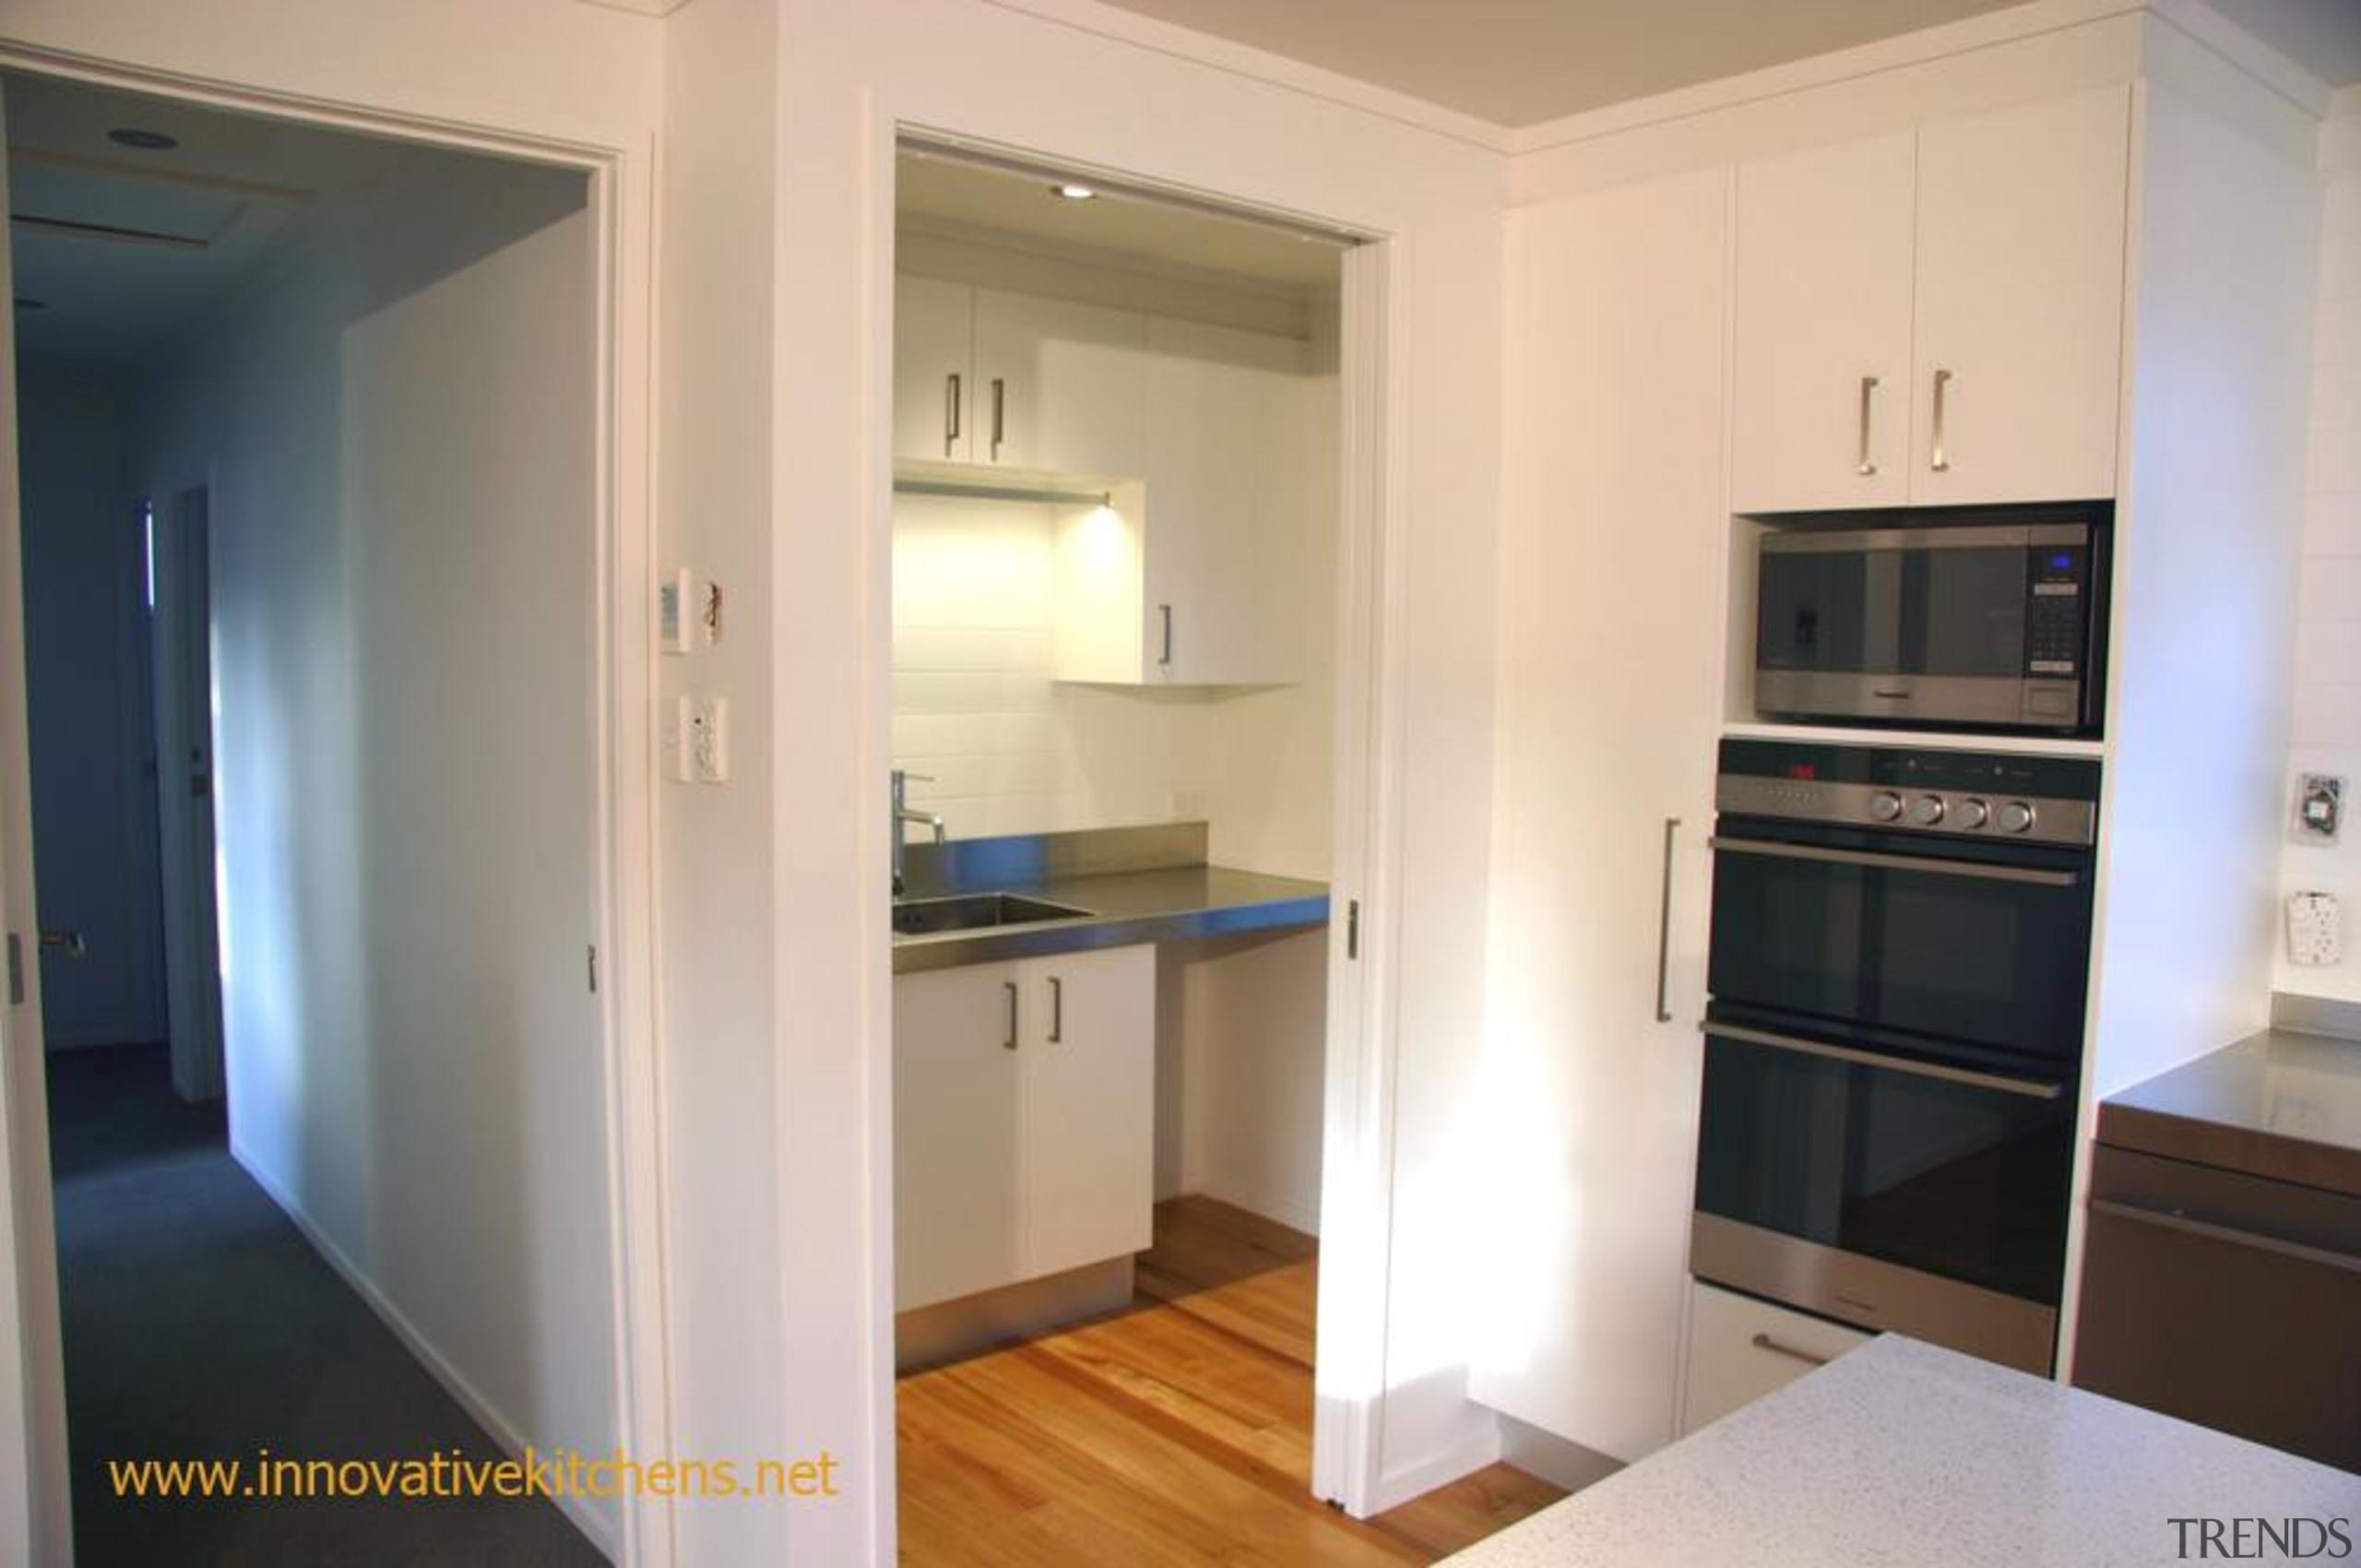 moder_glendowie_2013_7.jpg - apartment | cabinetry | countertop | apartment, cabinetry, countertop, floor, home, home appliance, interior design, kitchen, property, real estate, room, gray